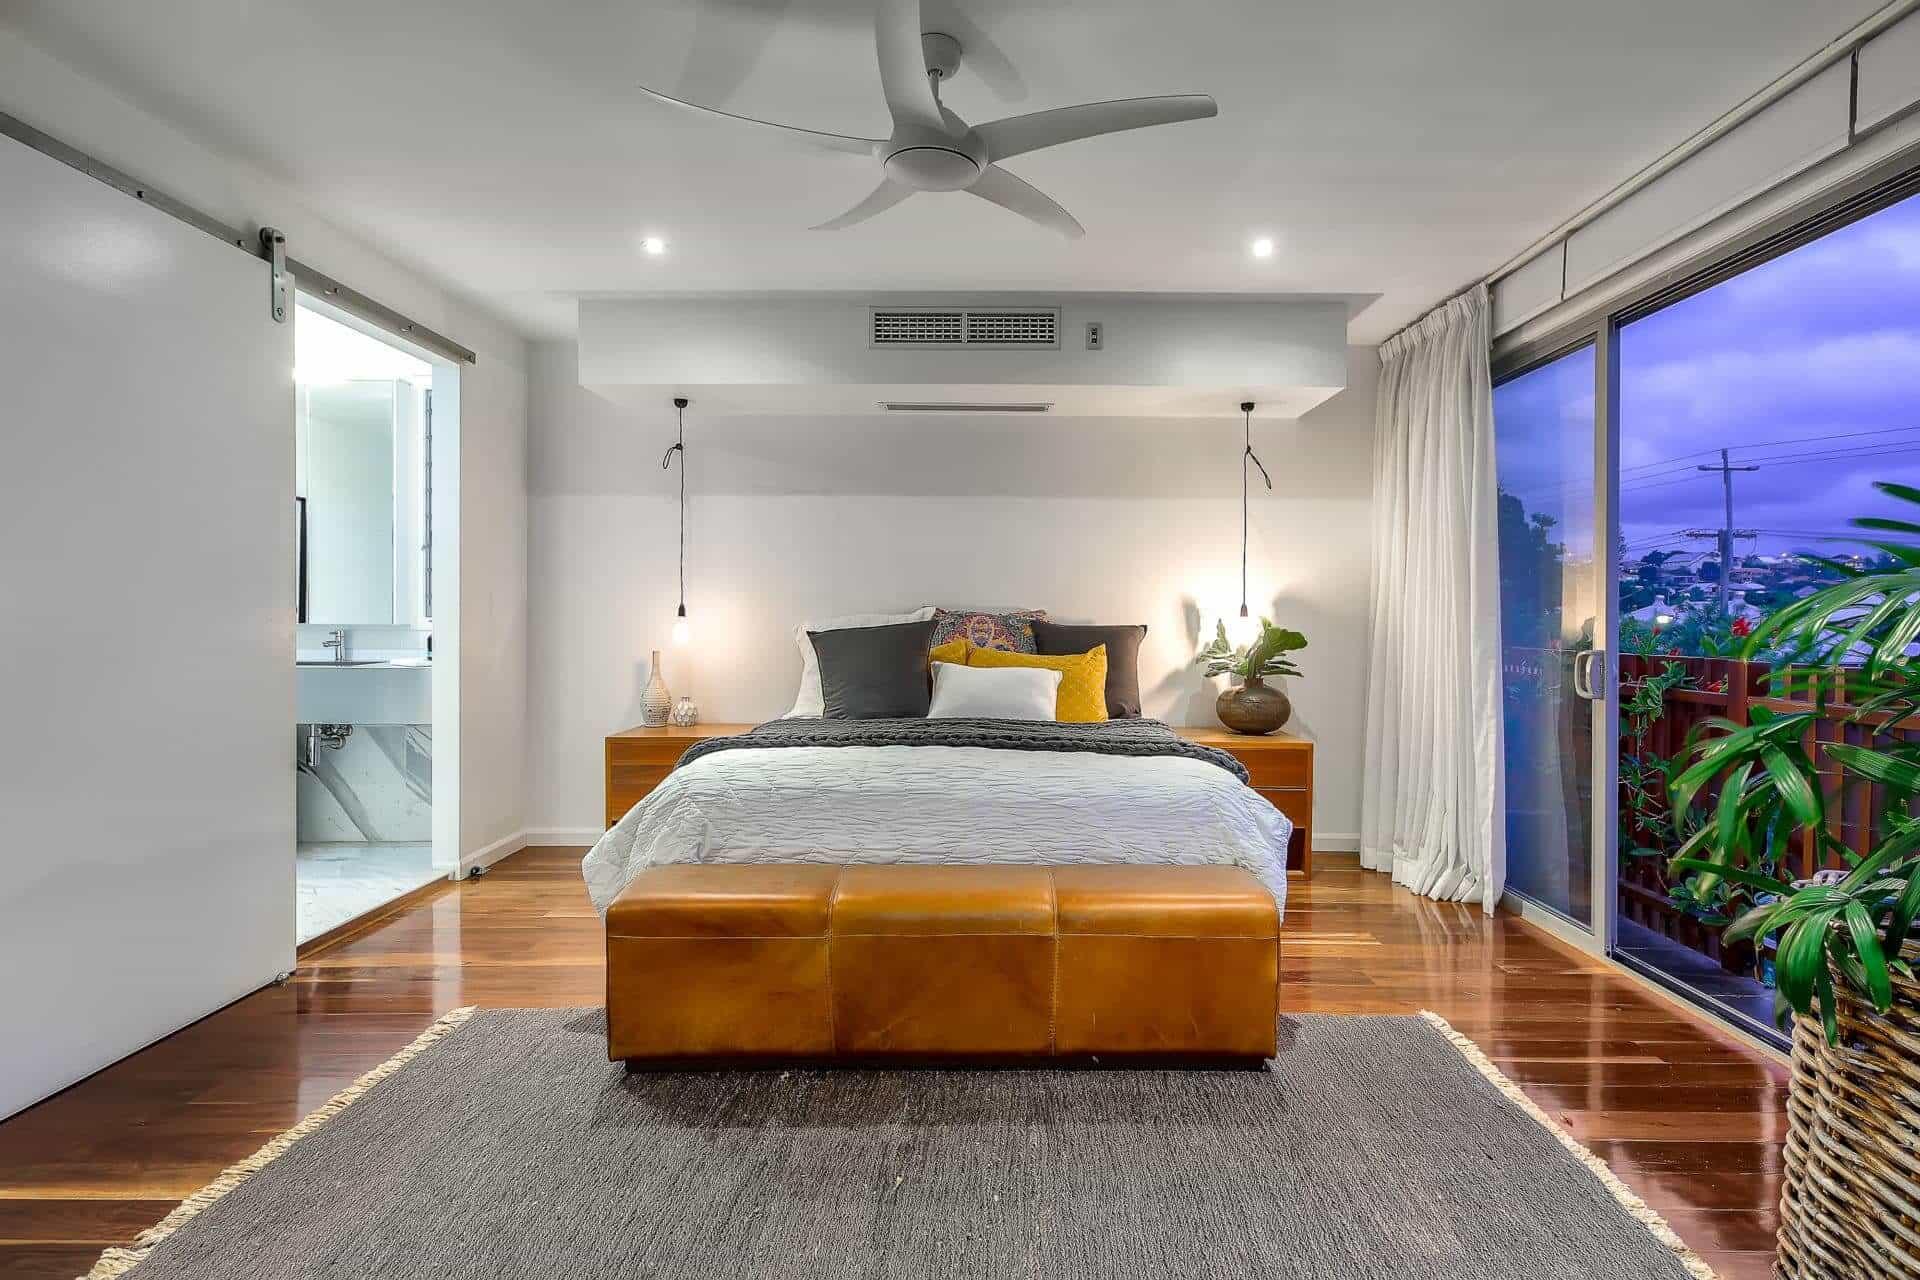 Bedroom Decorating Ideas 4